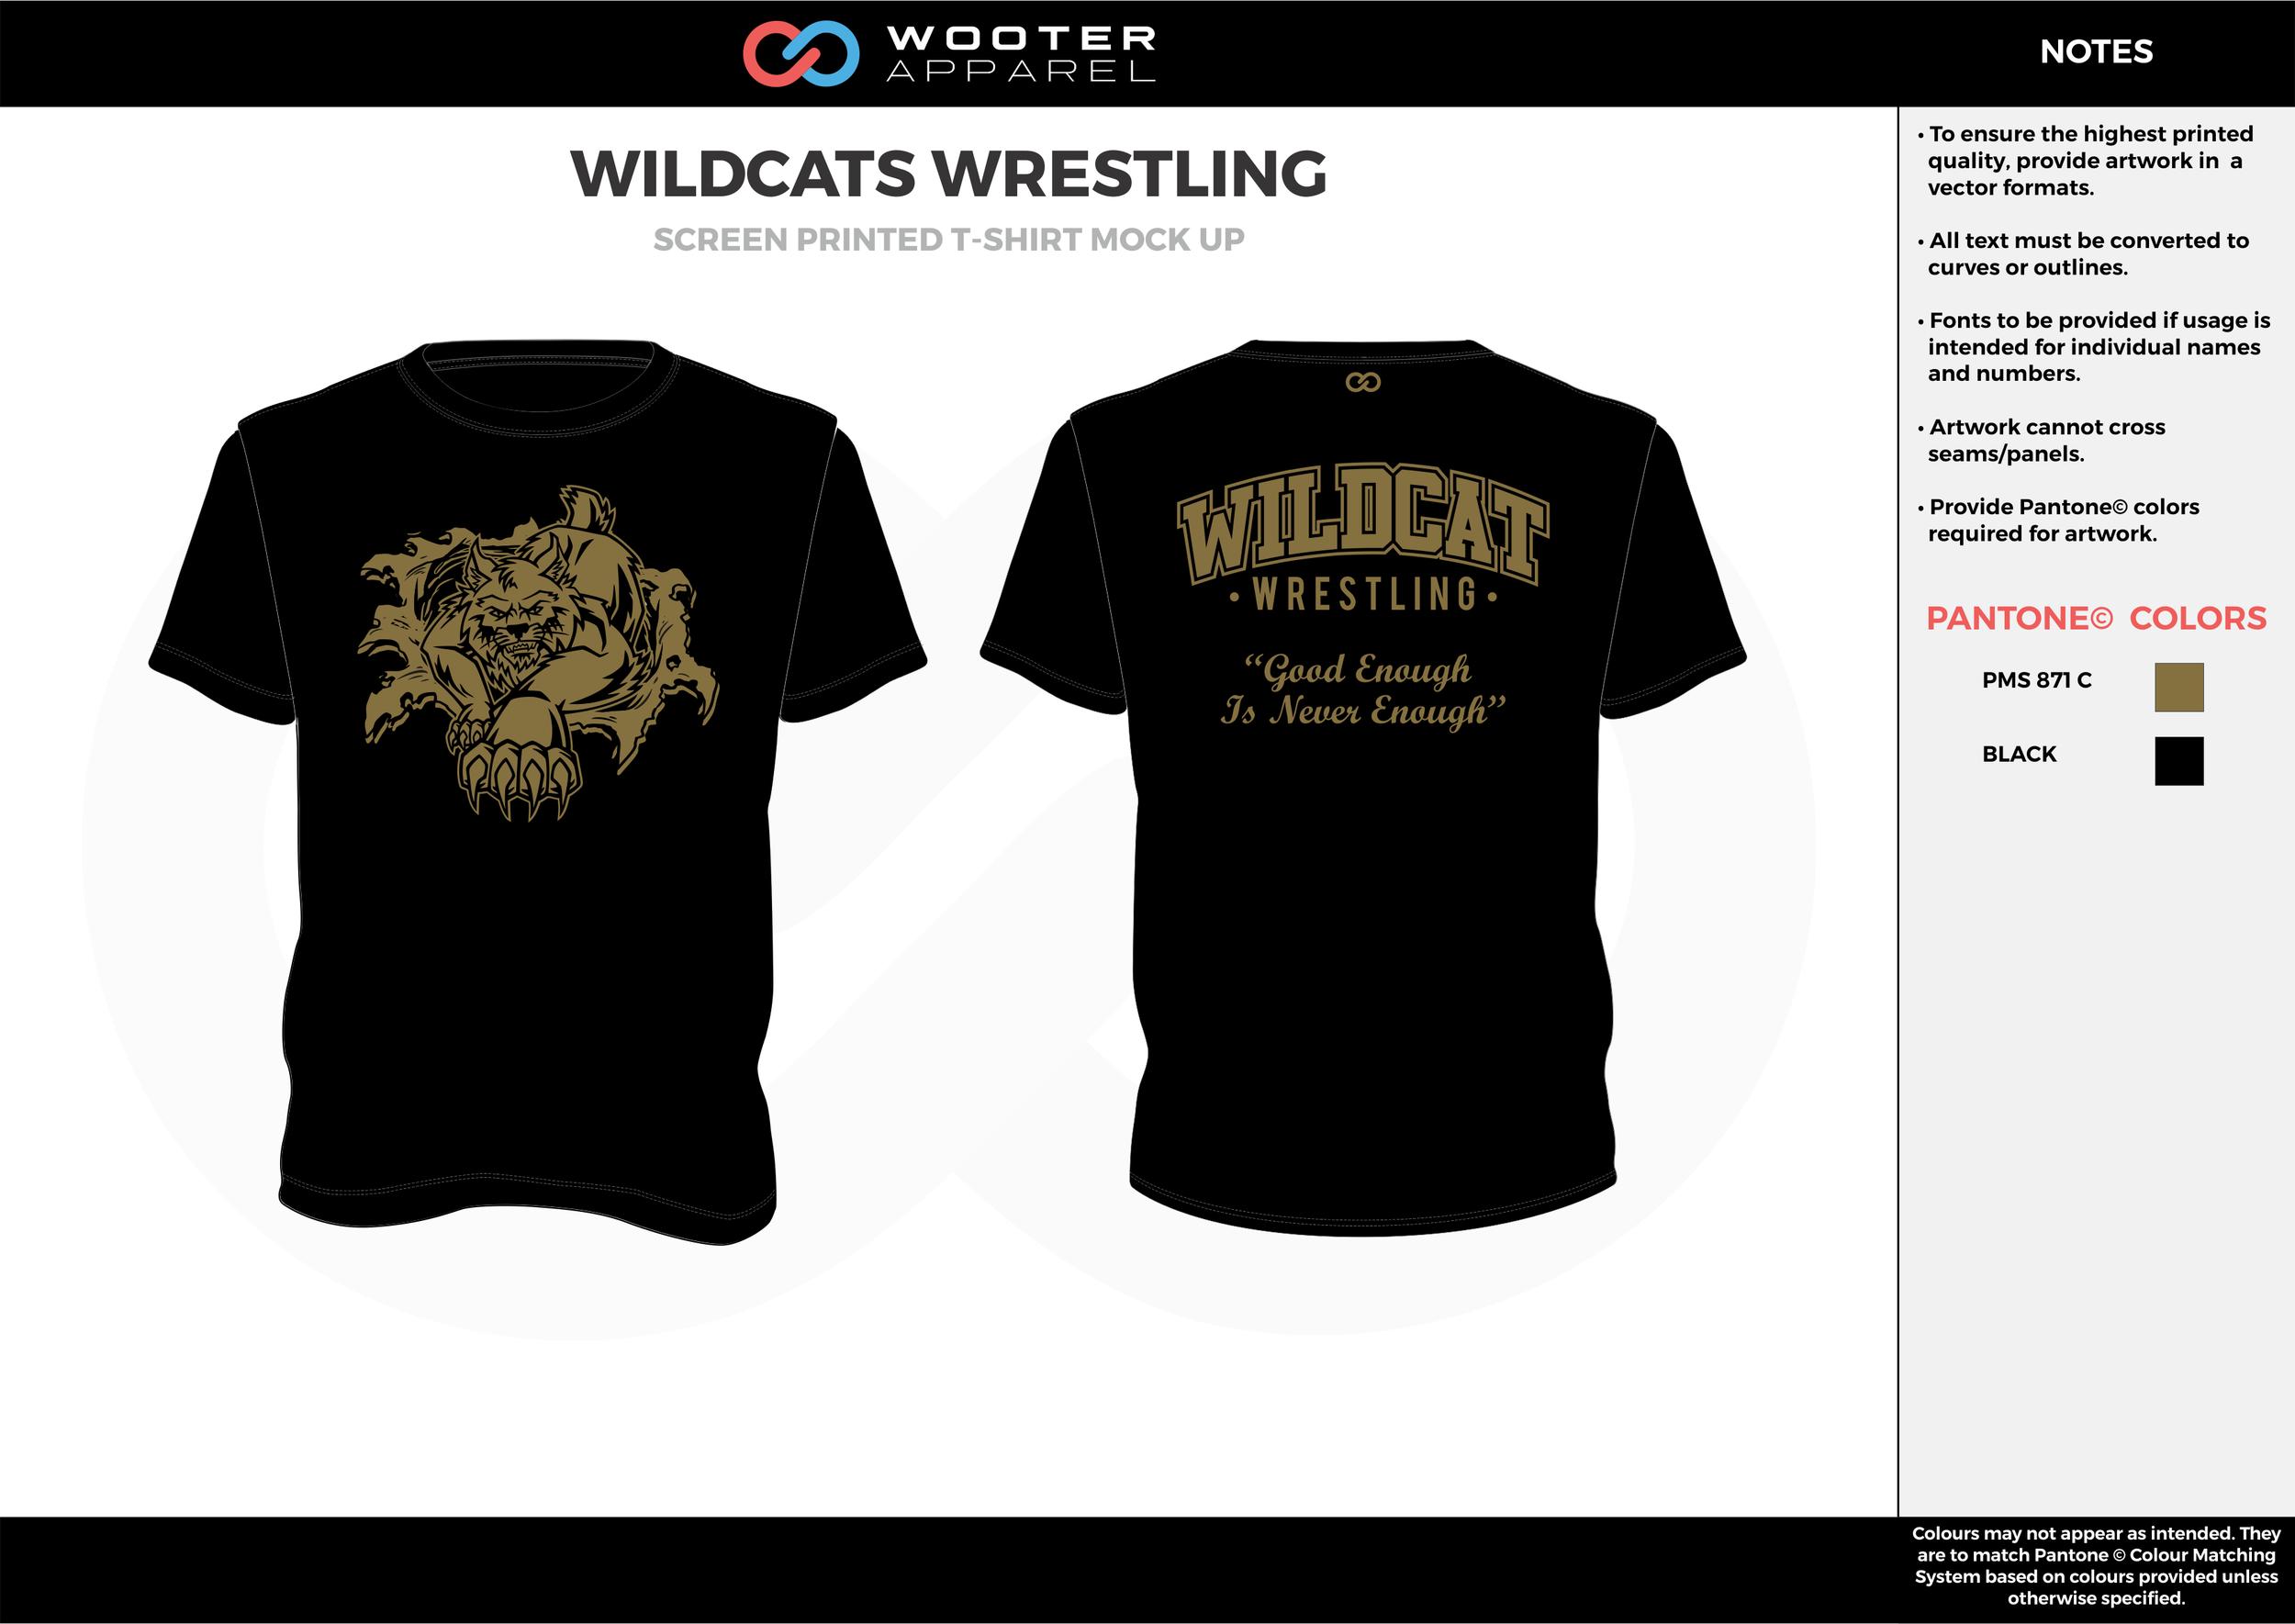 WILDCATS Brown Black Screen Printed Wrestling T-Shirt